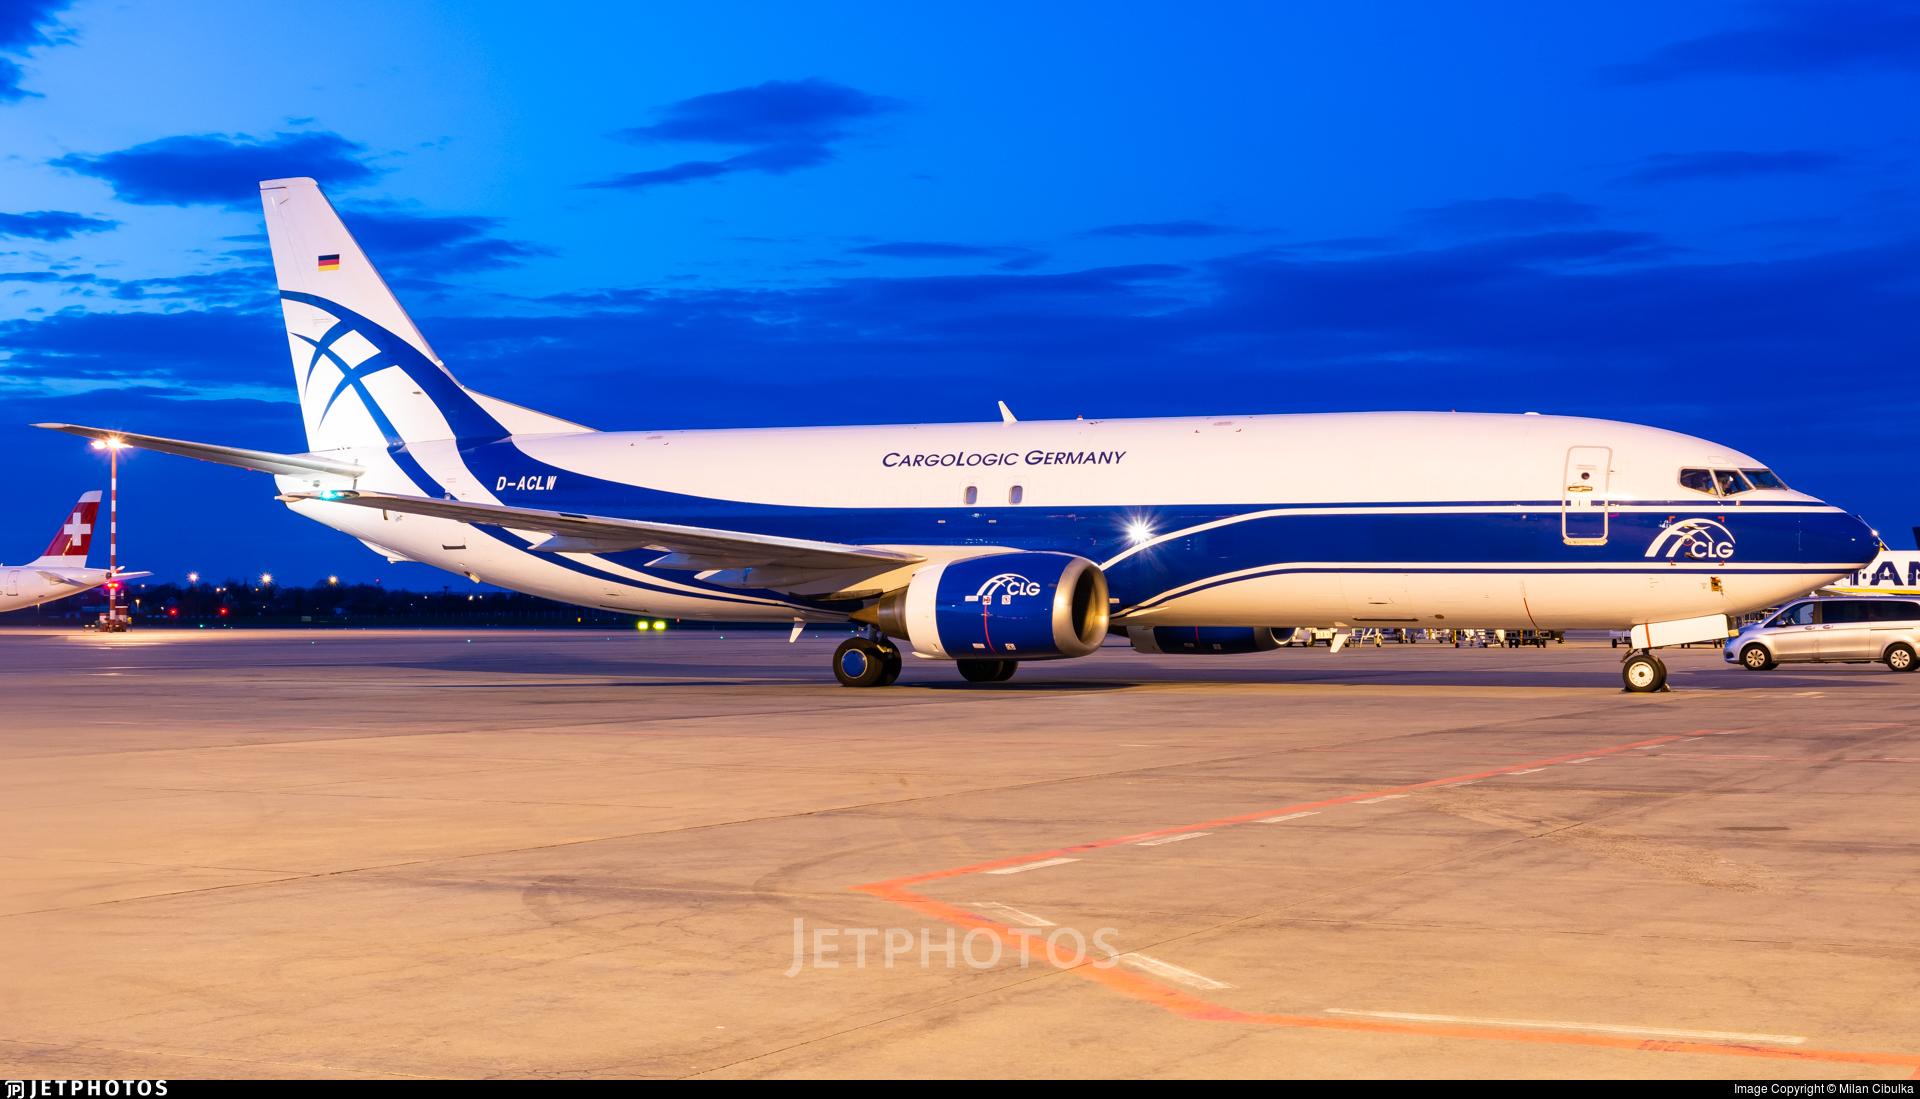 D-ACLW - Boeing 737-48E(SF) - CargoLogic Germany